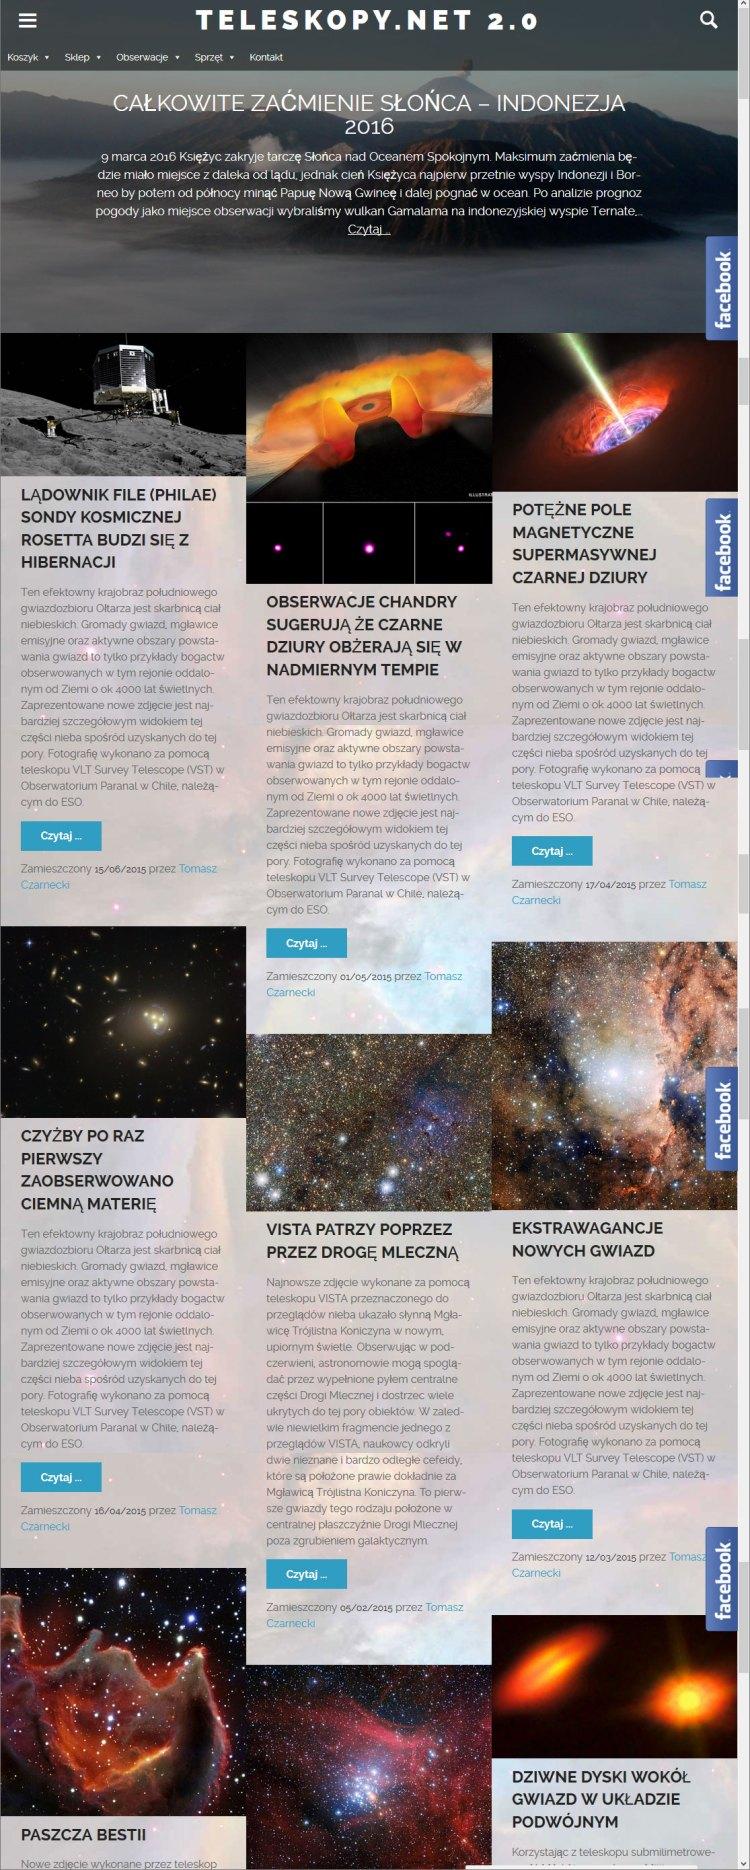 teleskopy.net v2.0